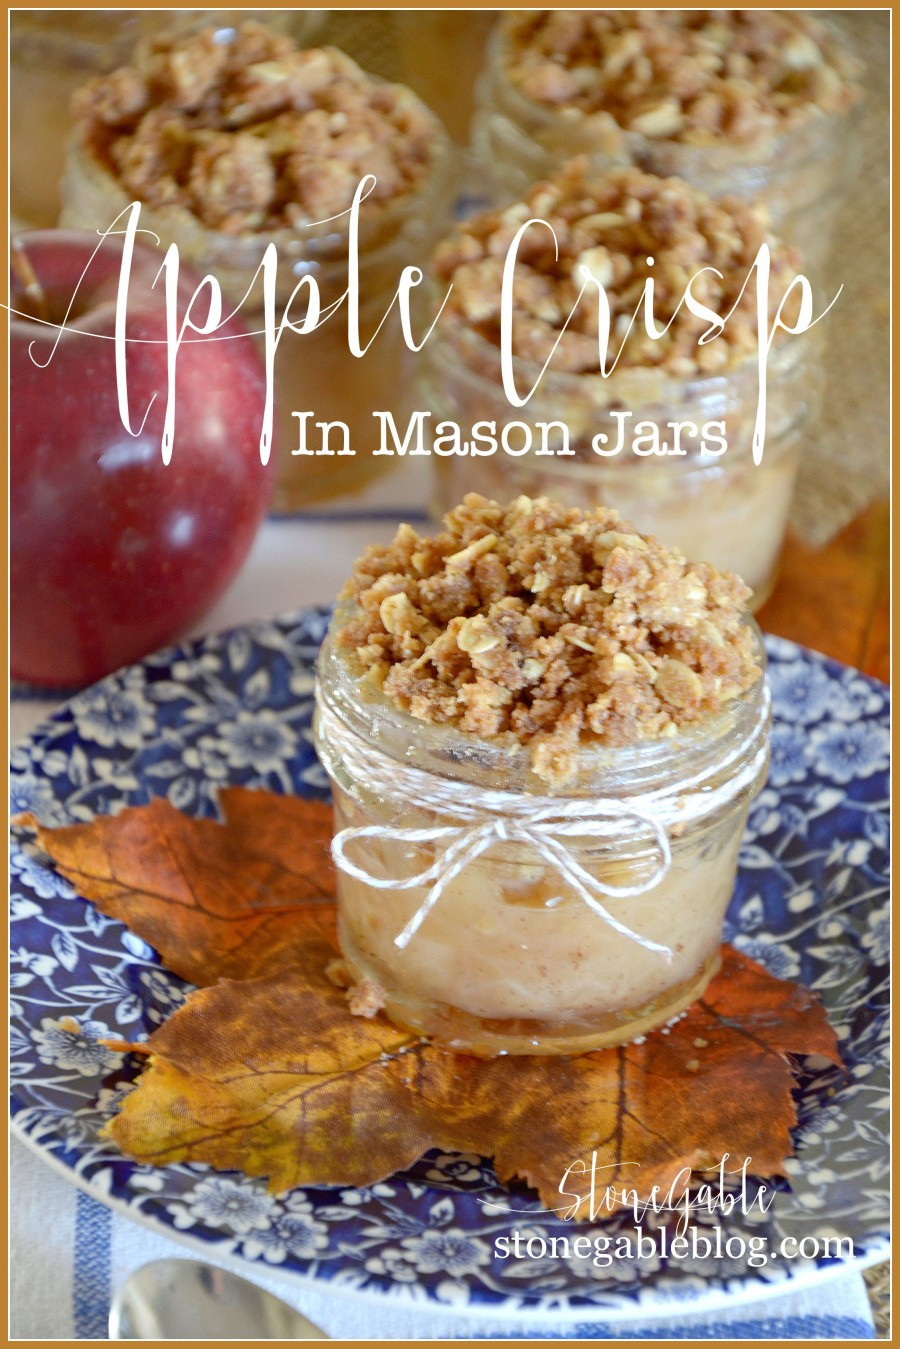 Mason Jar Dessert Recipes  APPLE CRISP IN A MASON JARS StoneGable